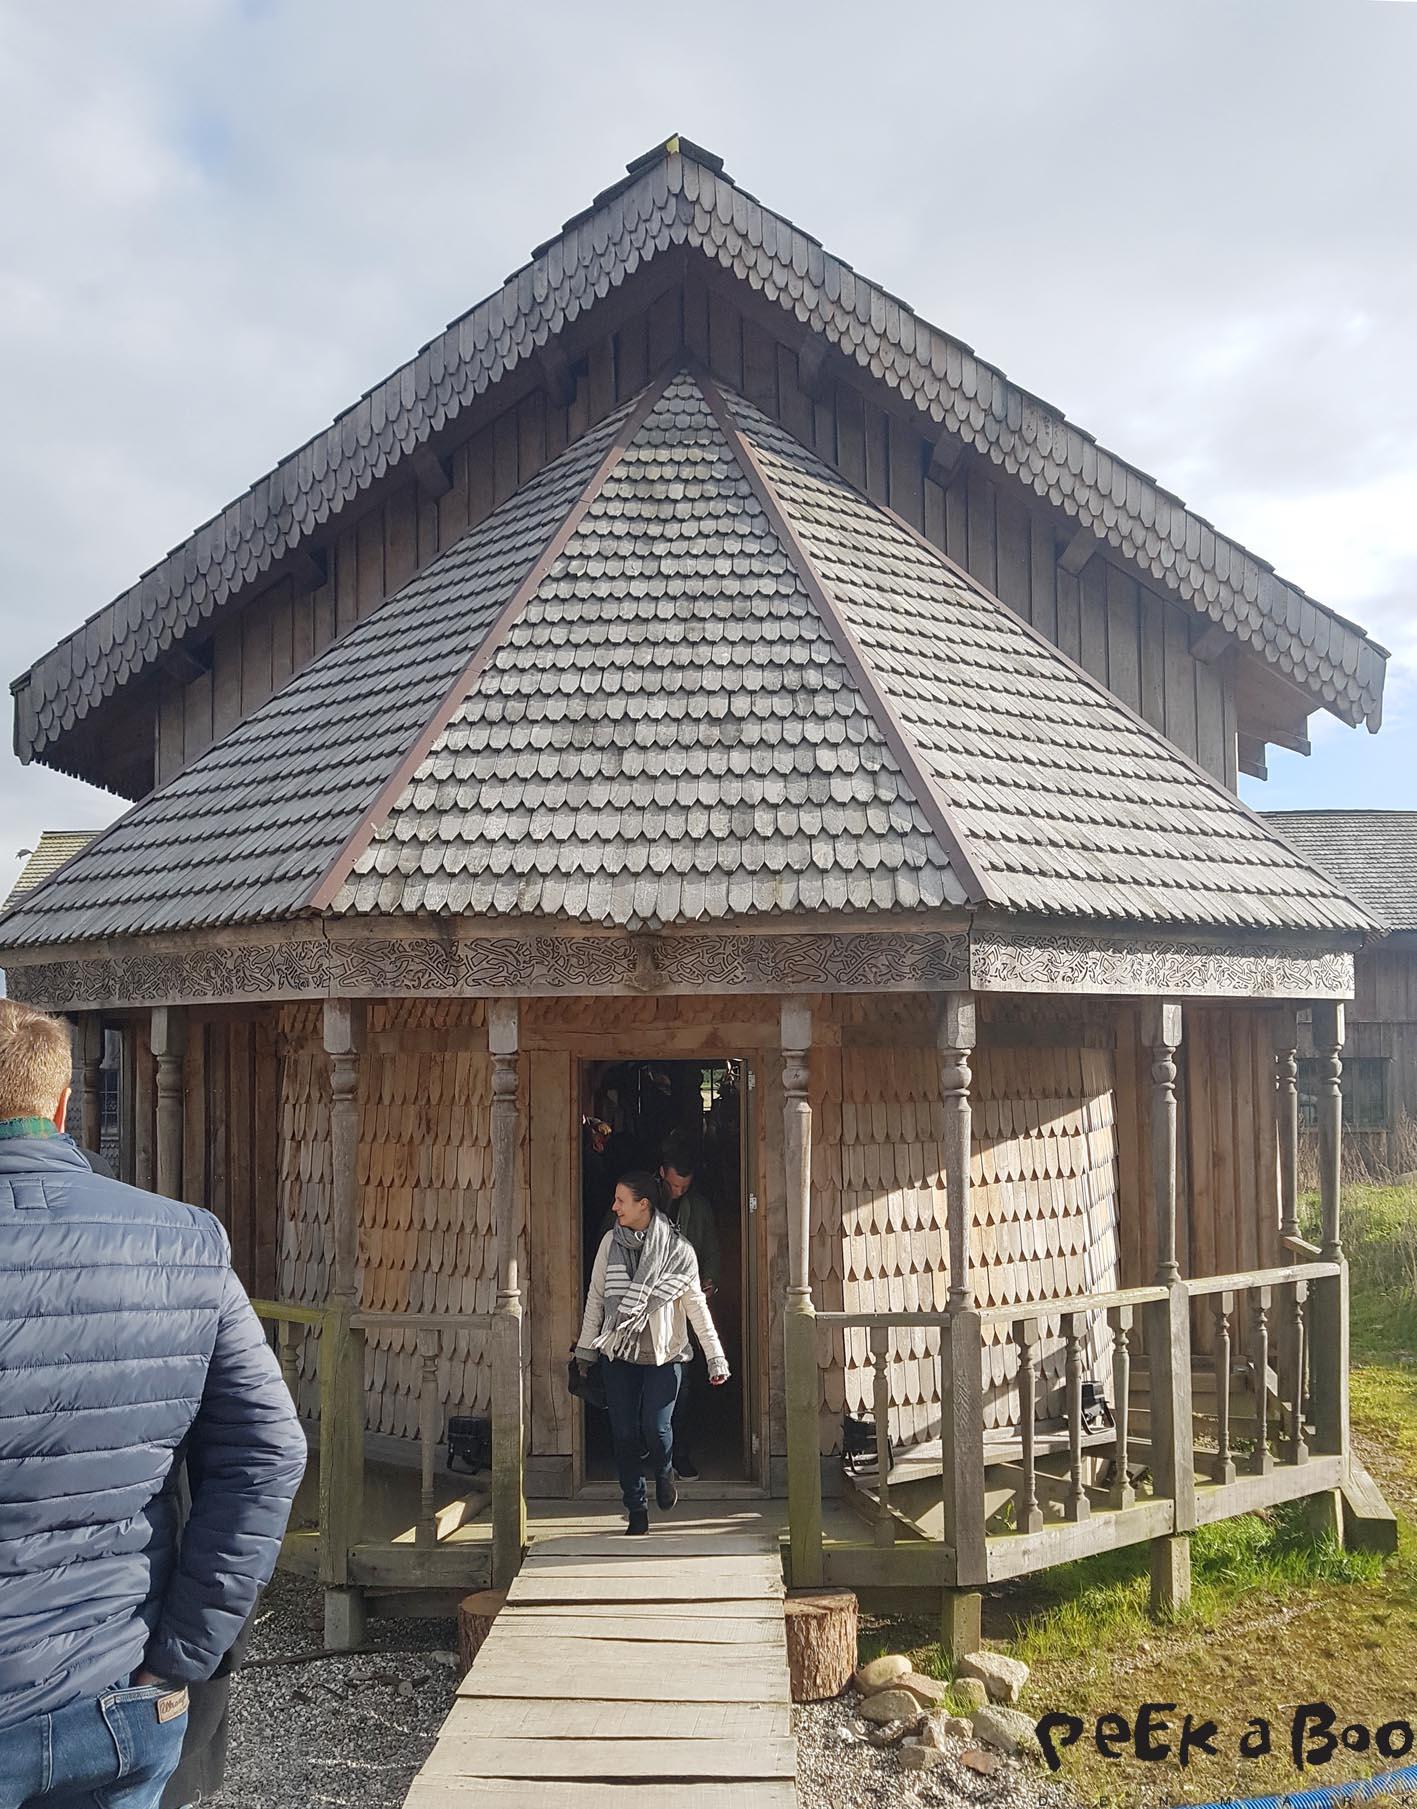 The viking borg built by Jim Lyngvild